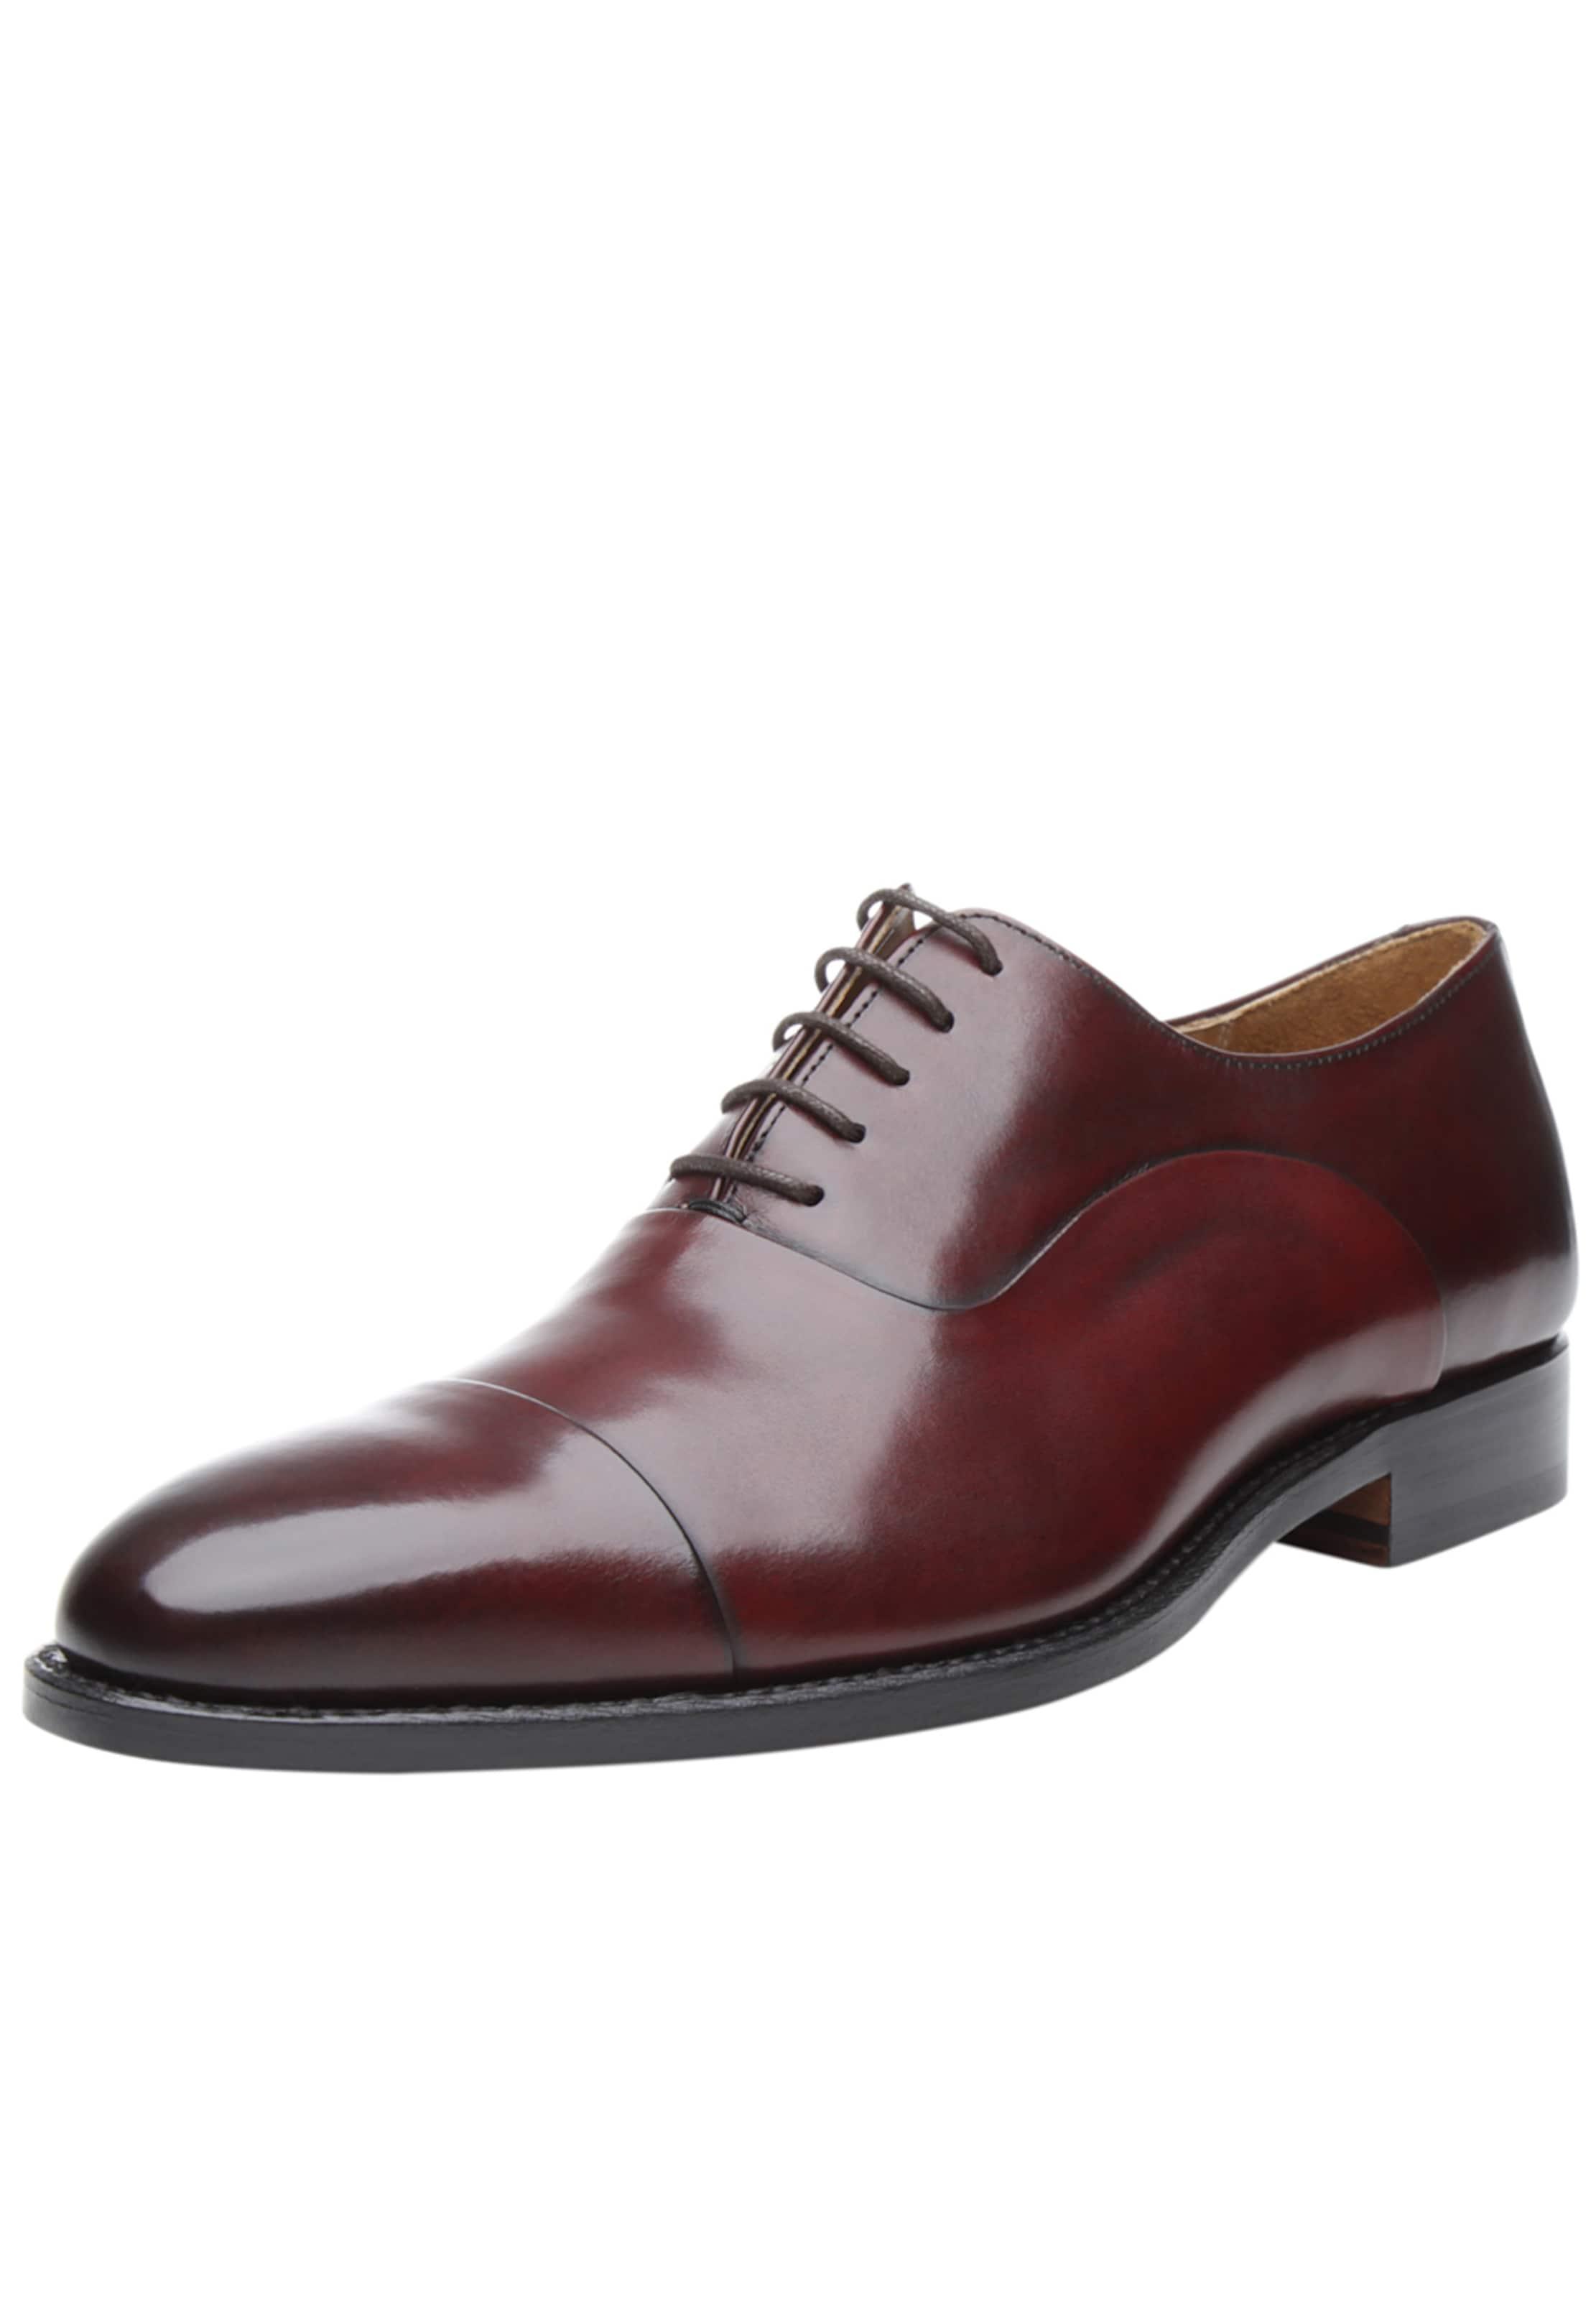 SHOEPASSION Halbschuhe No. 5228 Verschleißfeste billige Schuhe